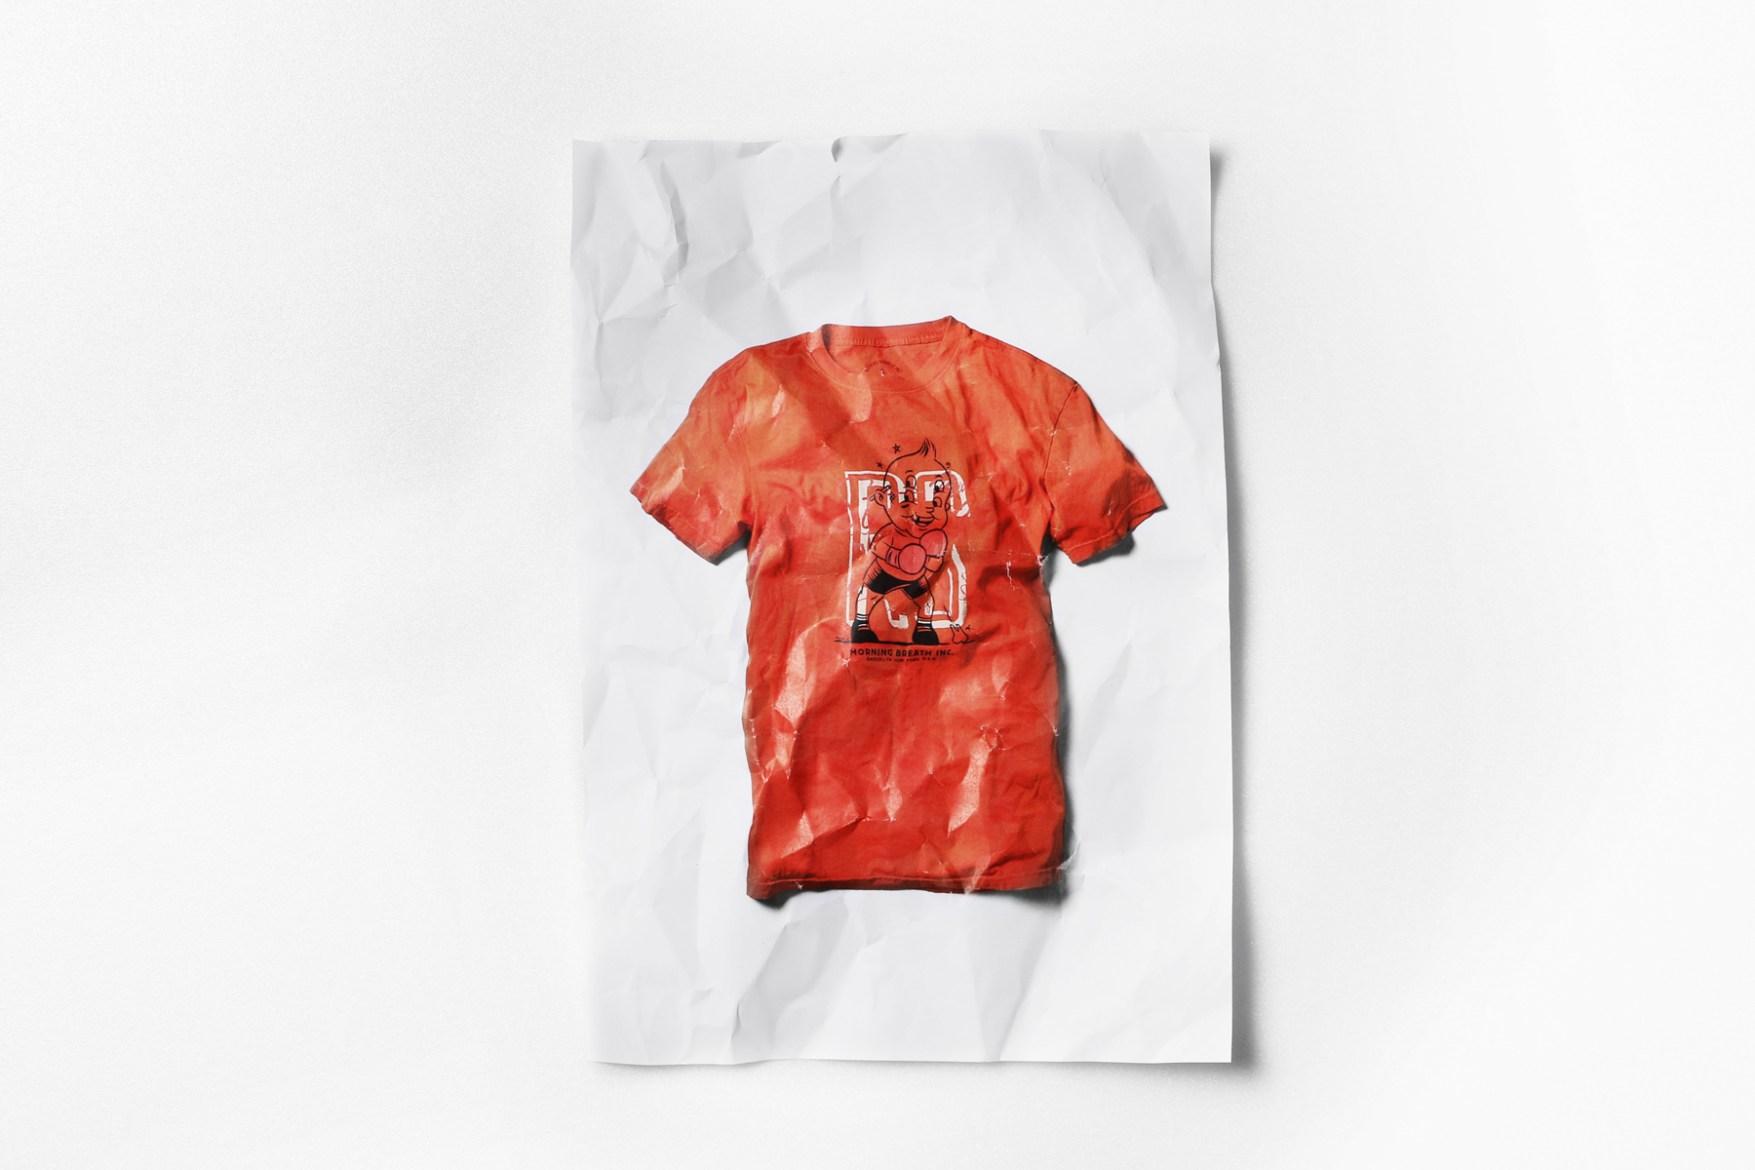 Morning Breath Inc. x Altamont T-shirts